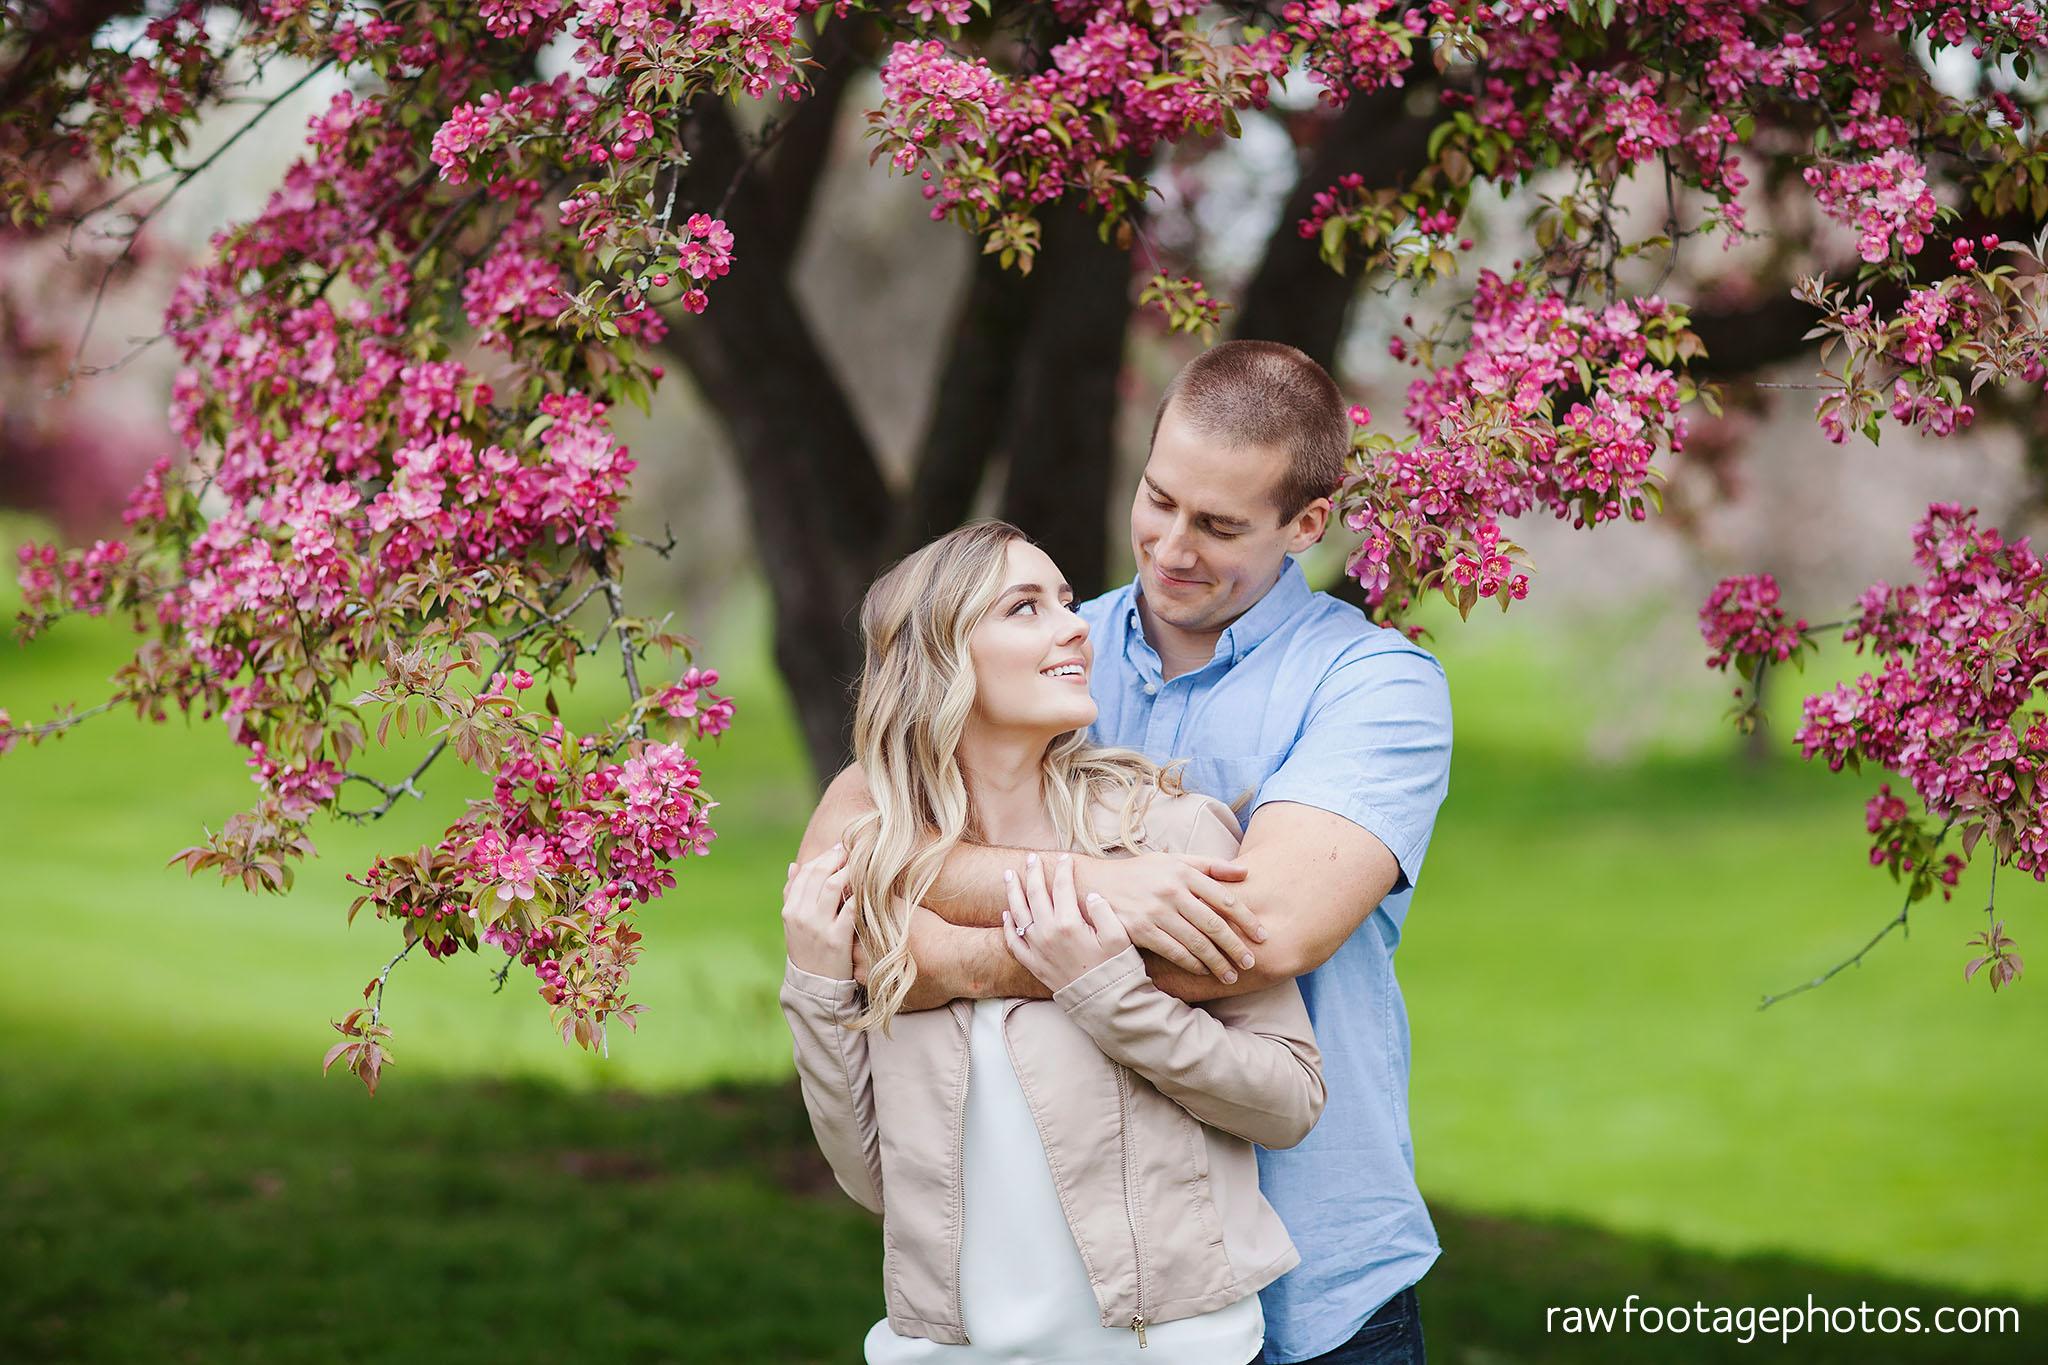 london_ontario_wedding_photographer-raw_footage_photography-engagement_session-engagement_photos-spring-blossoms-blooms005.jpg